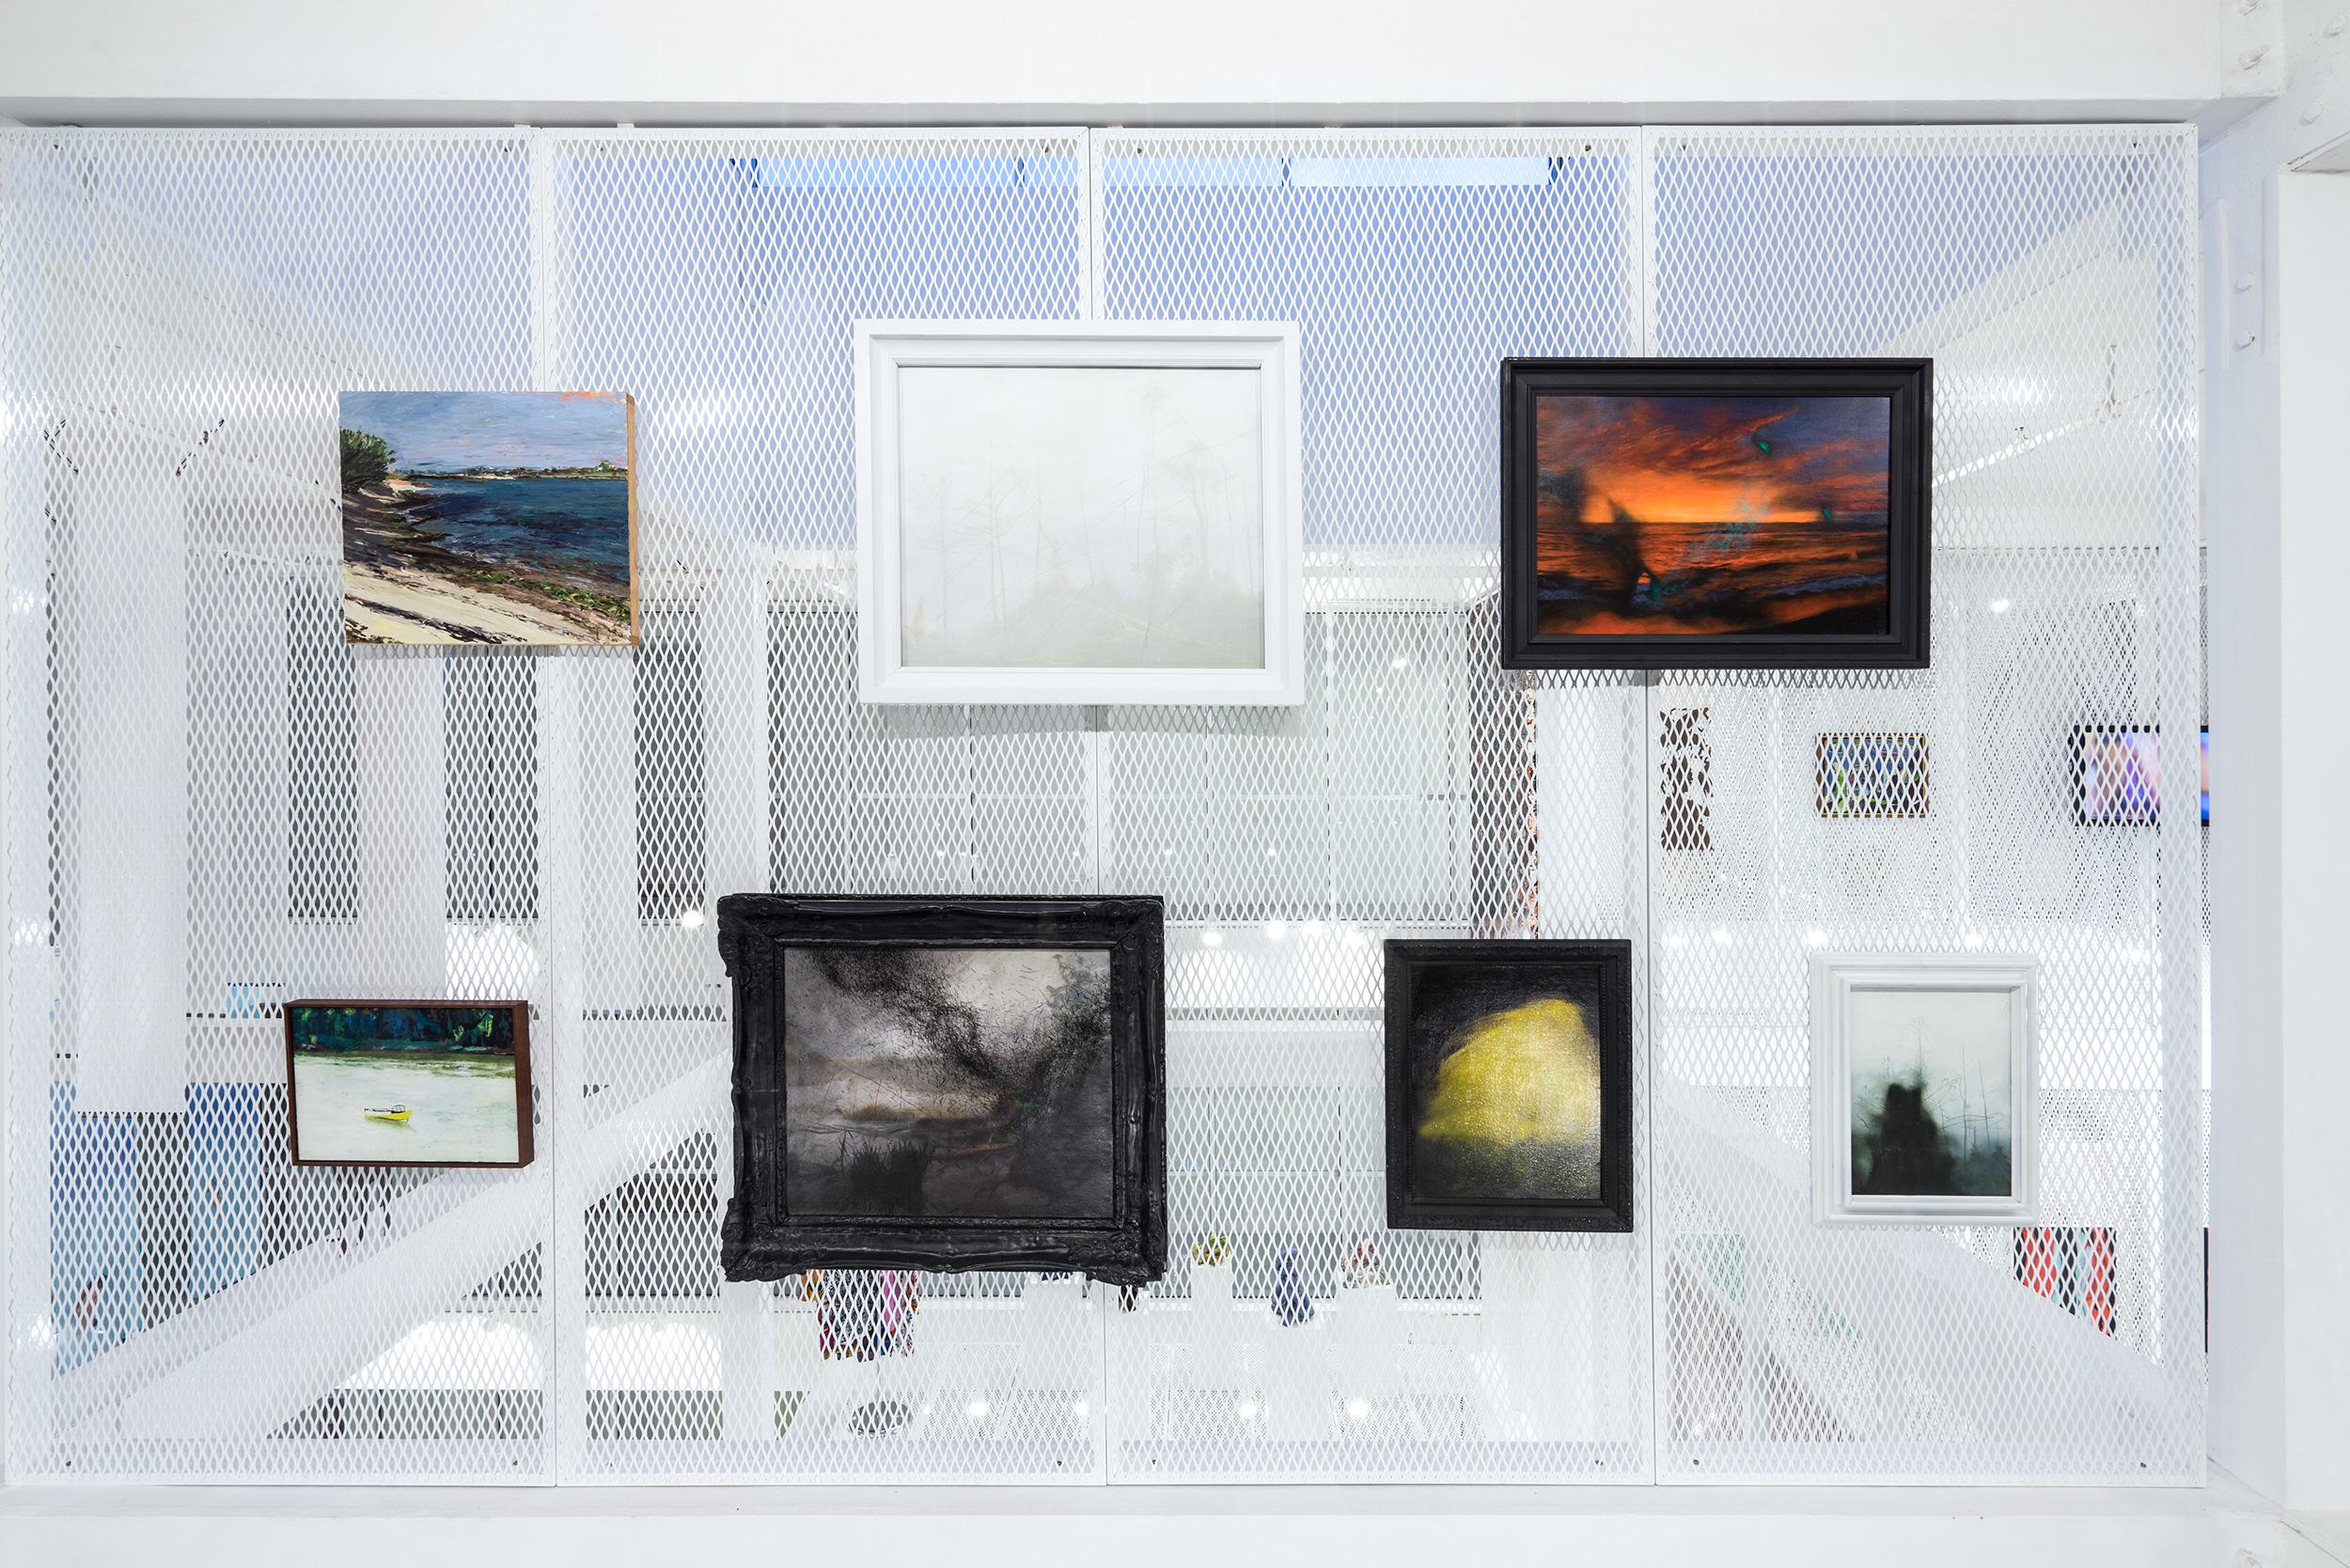 Paintings hung on racks from Scott Armetta; photo Studio LH00Q. Courtesy ICA Miami.